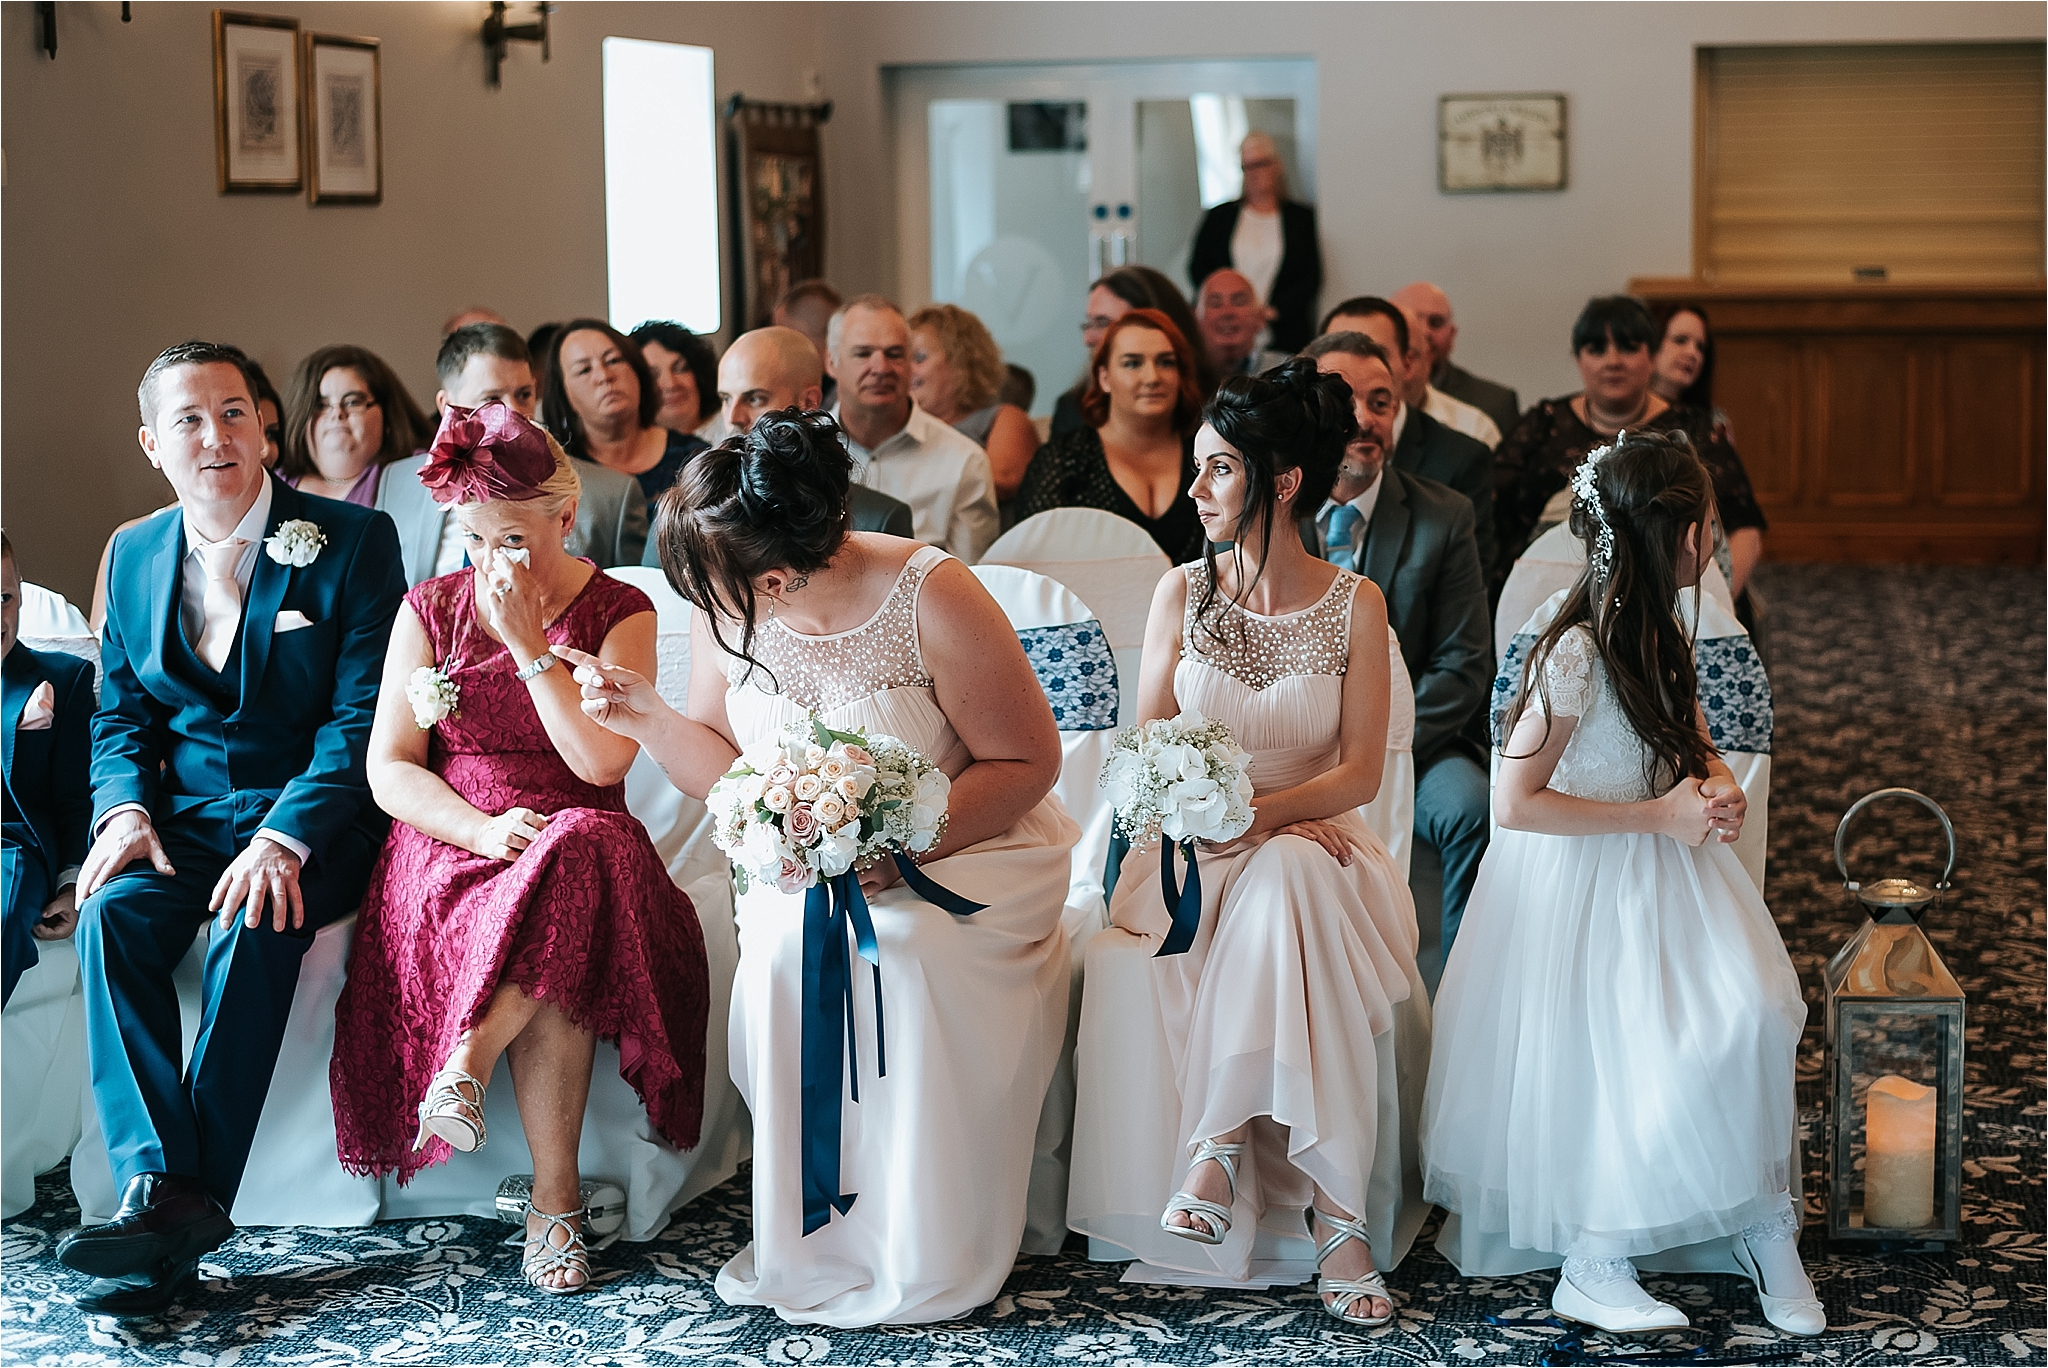 thevilla+lancashire+wreagreen+wedding+photographer28.jpg